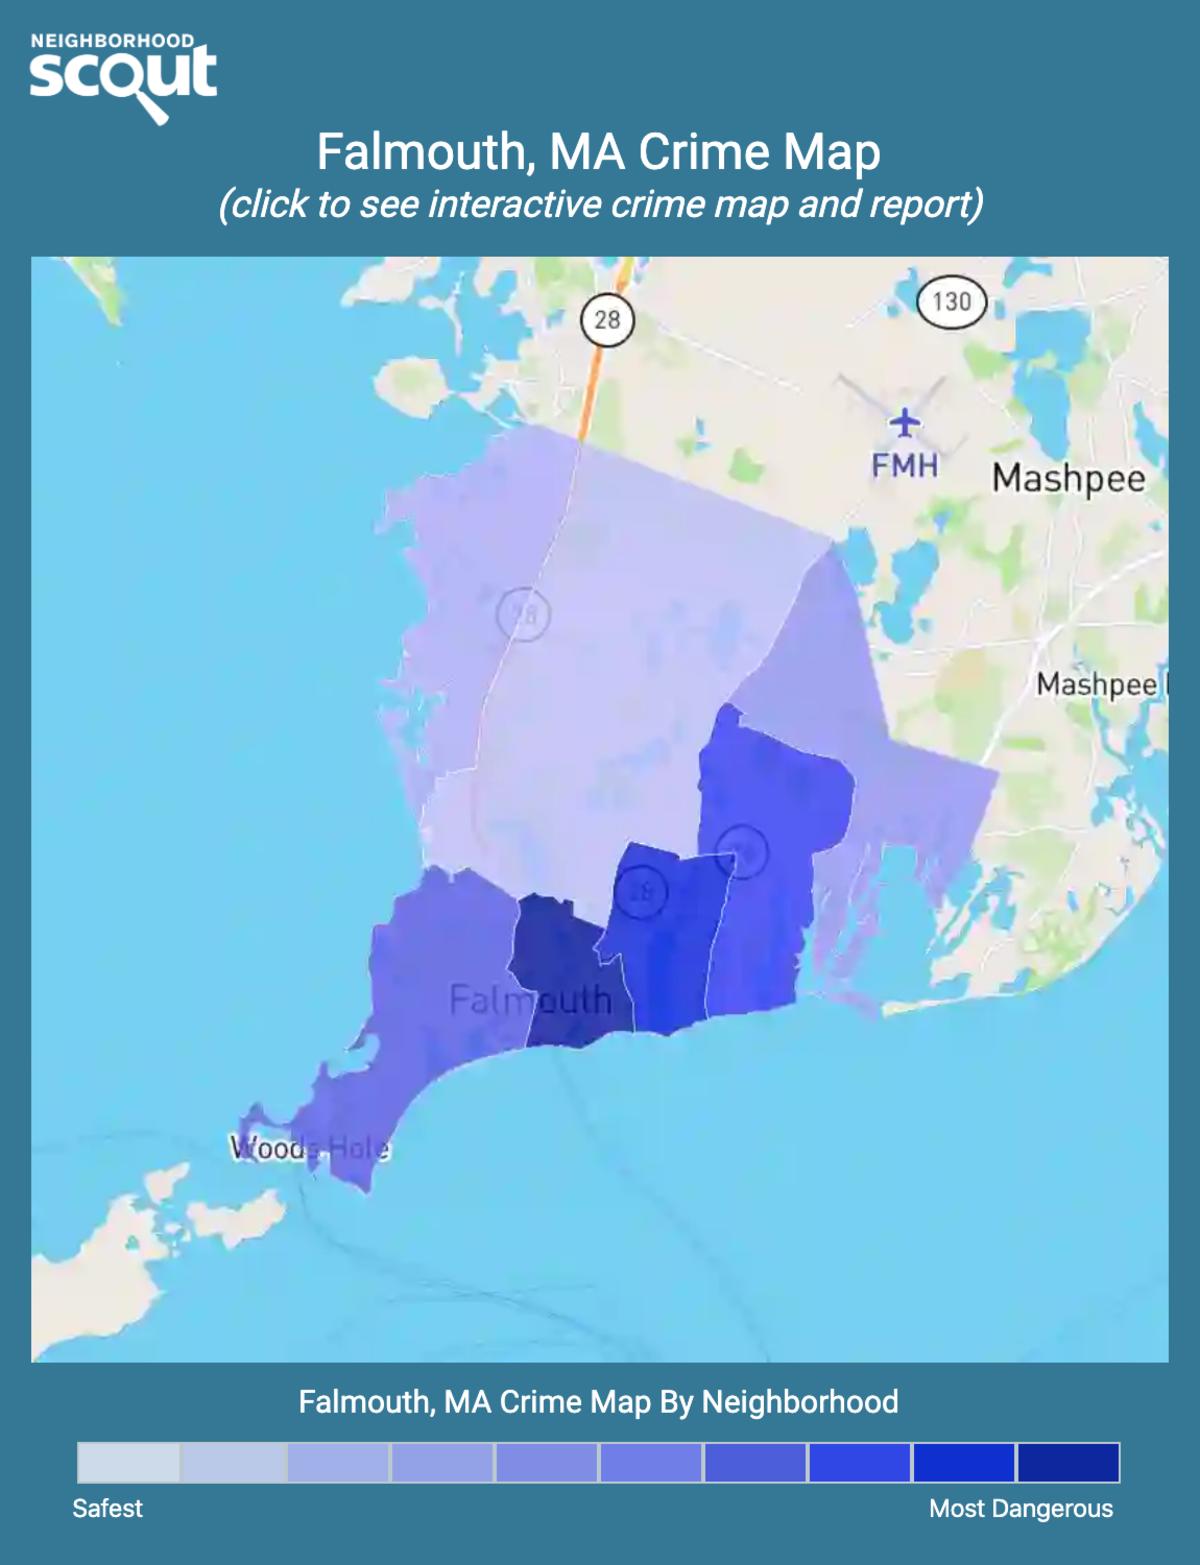 Falmouth, Massachusetts crime map